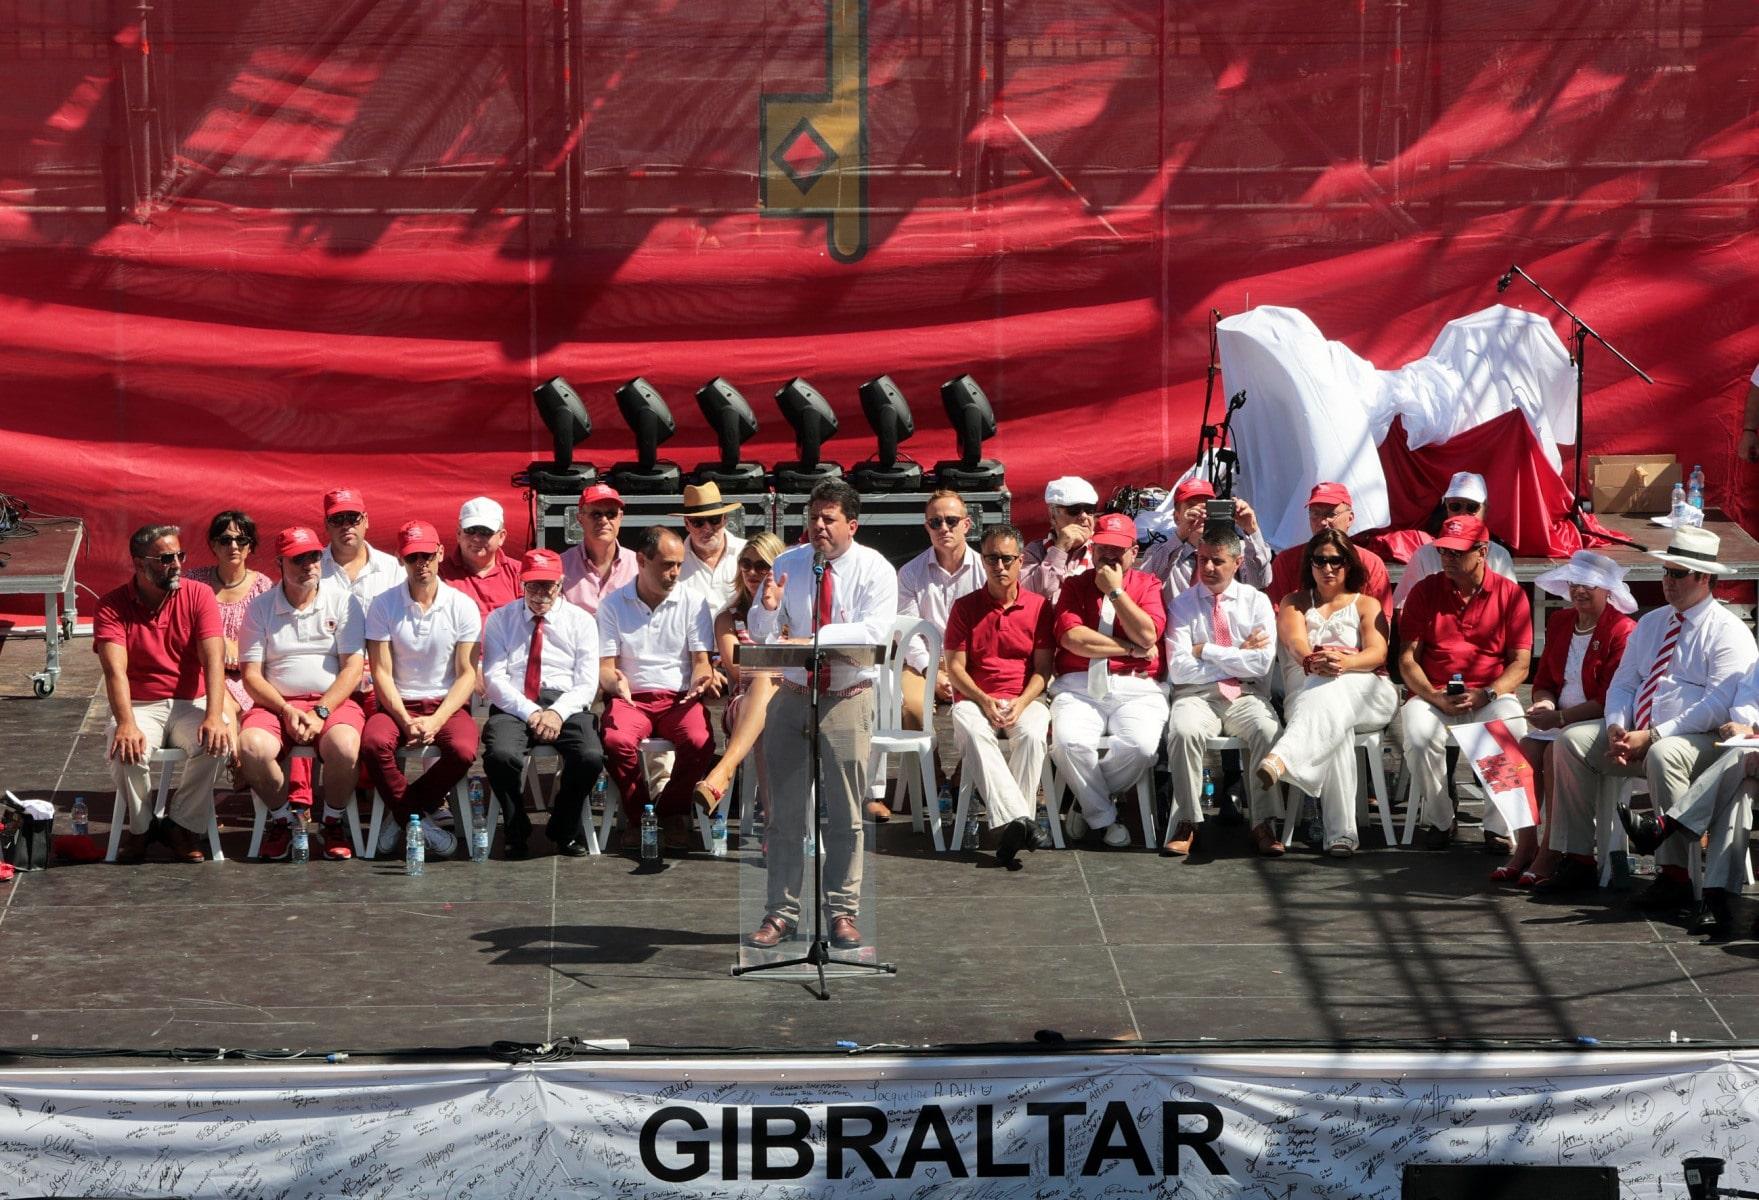 160910-national-day-gibraltar-2016-50_28979563664_o